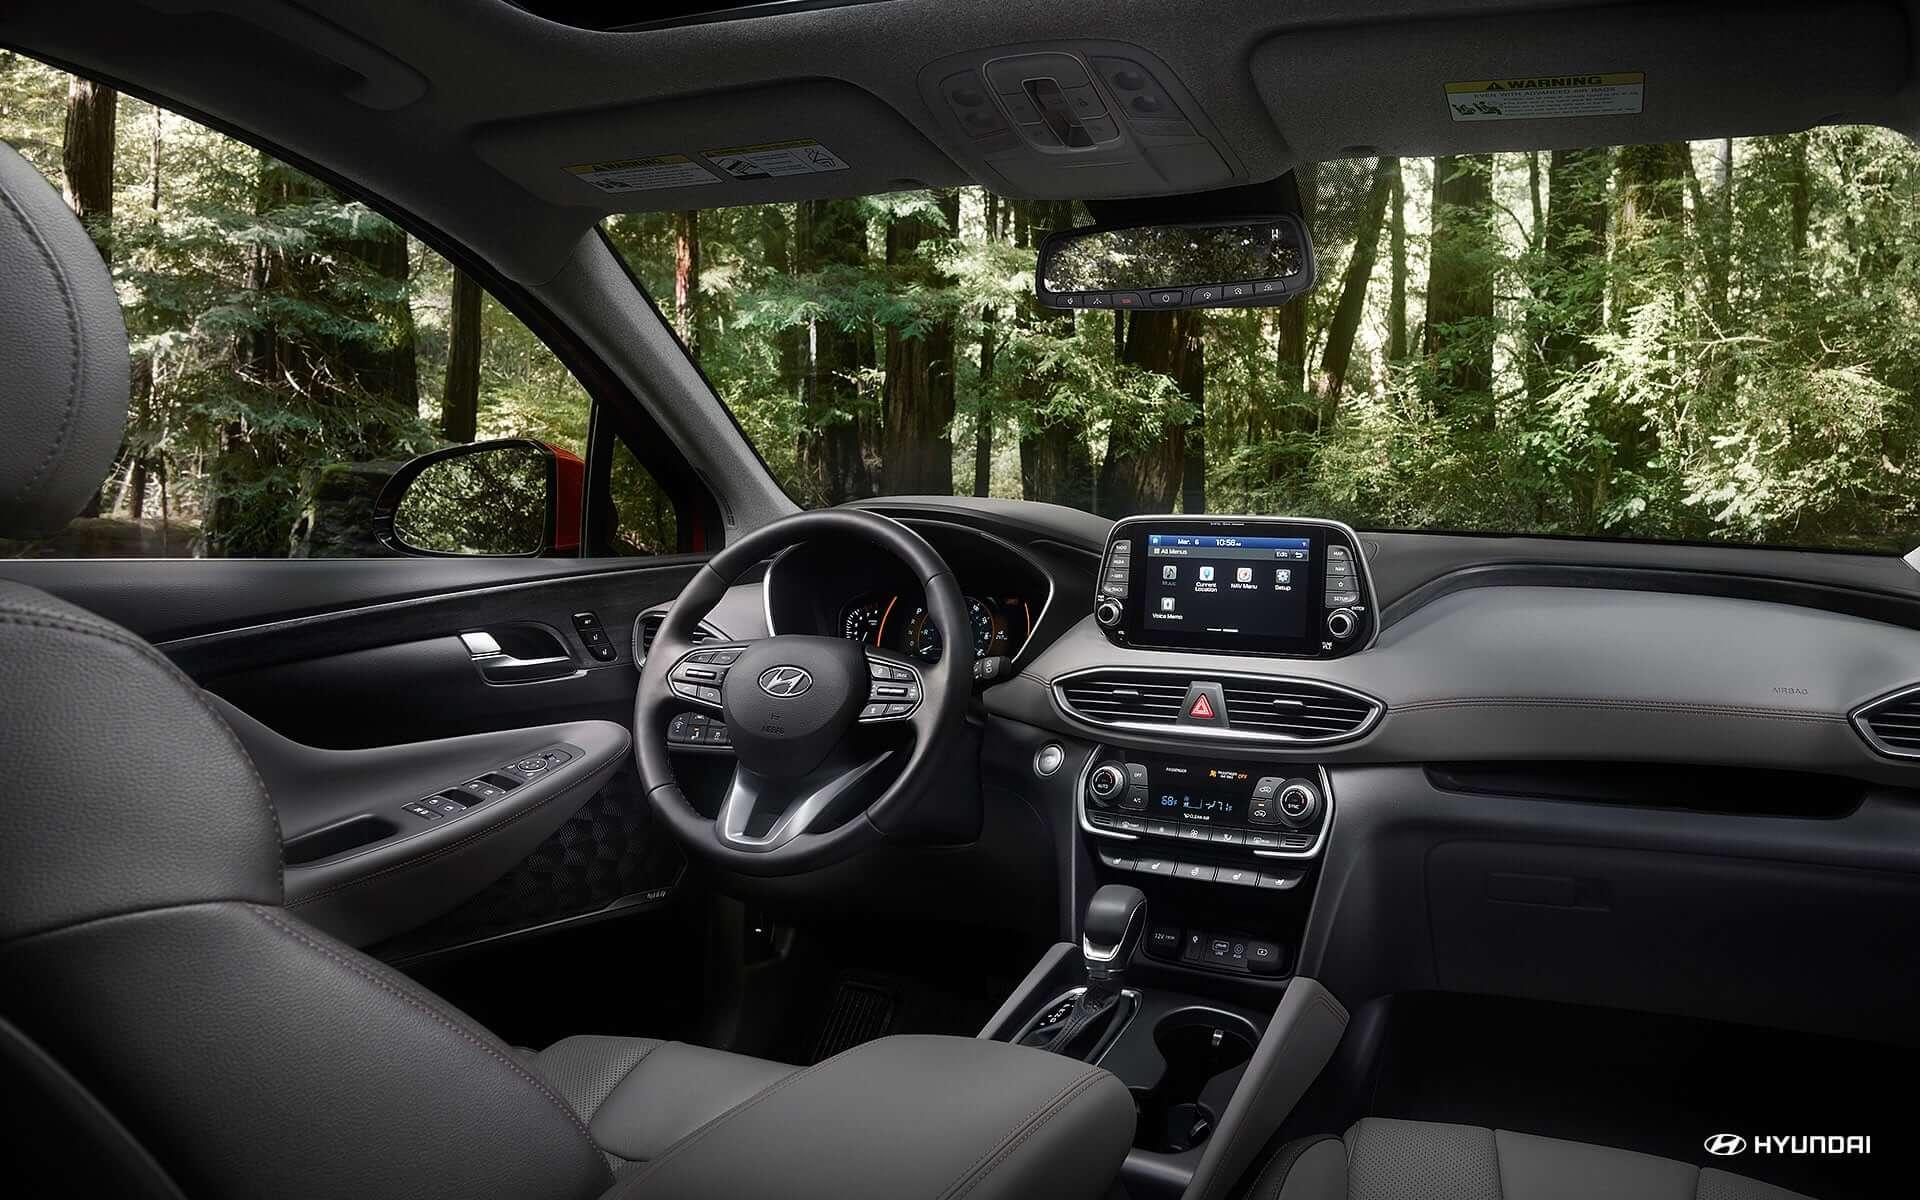 Hyundai unveils suv for family camping 2019 santa fe - Santa fe hyundai interior pictures ...